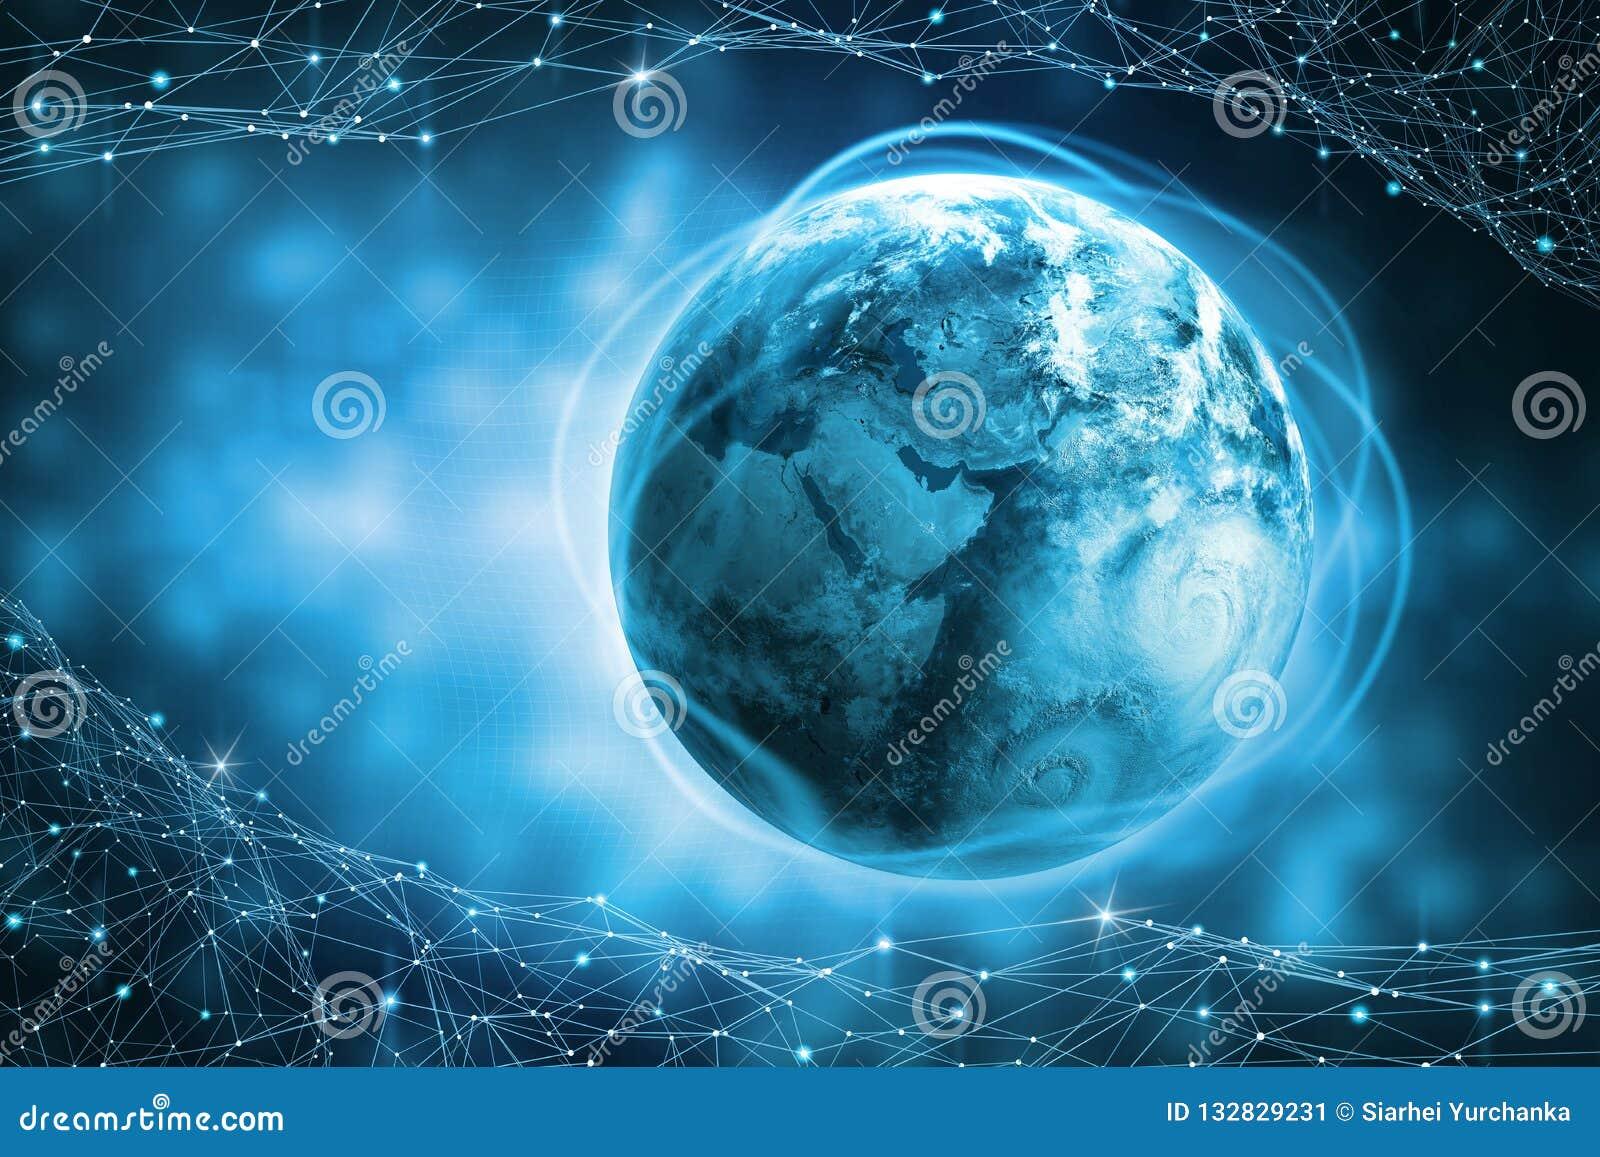 Blockchain技术 行星地球的全球性信息领域 保护和处理数字资料